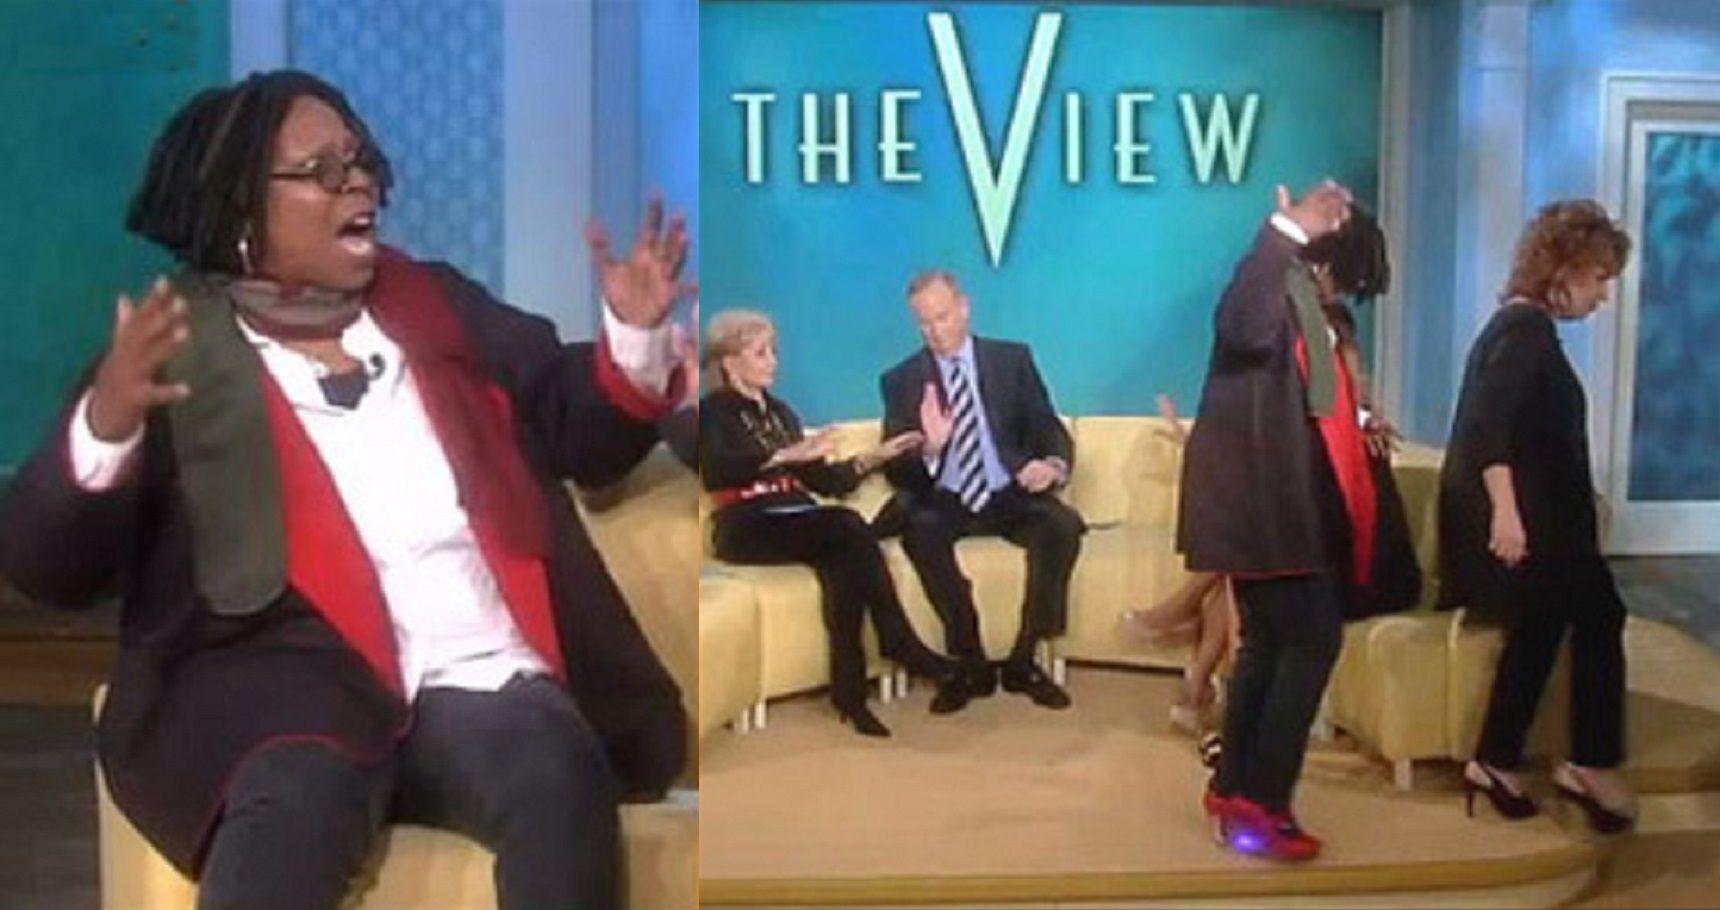 12 Agonizingly Awkward Celebrity Interview Walkouts